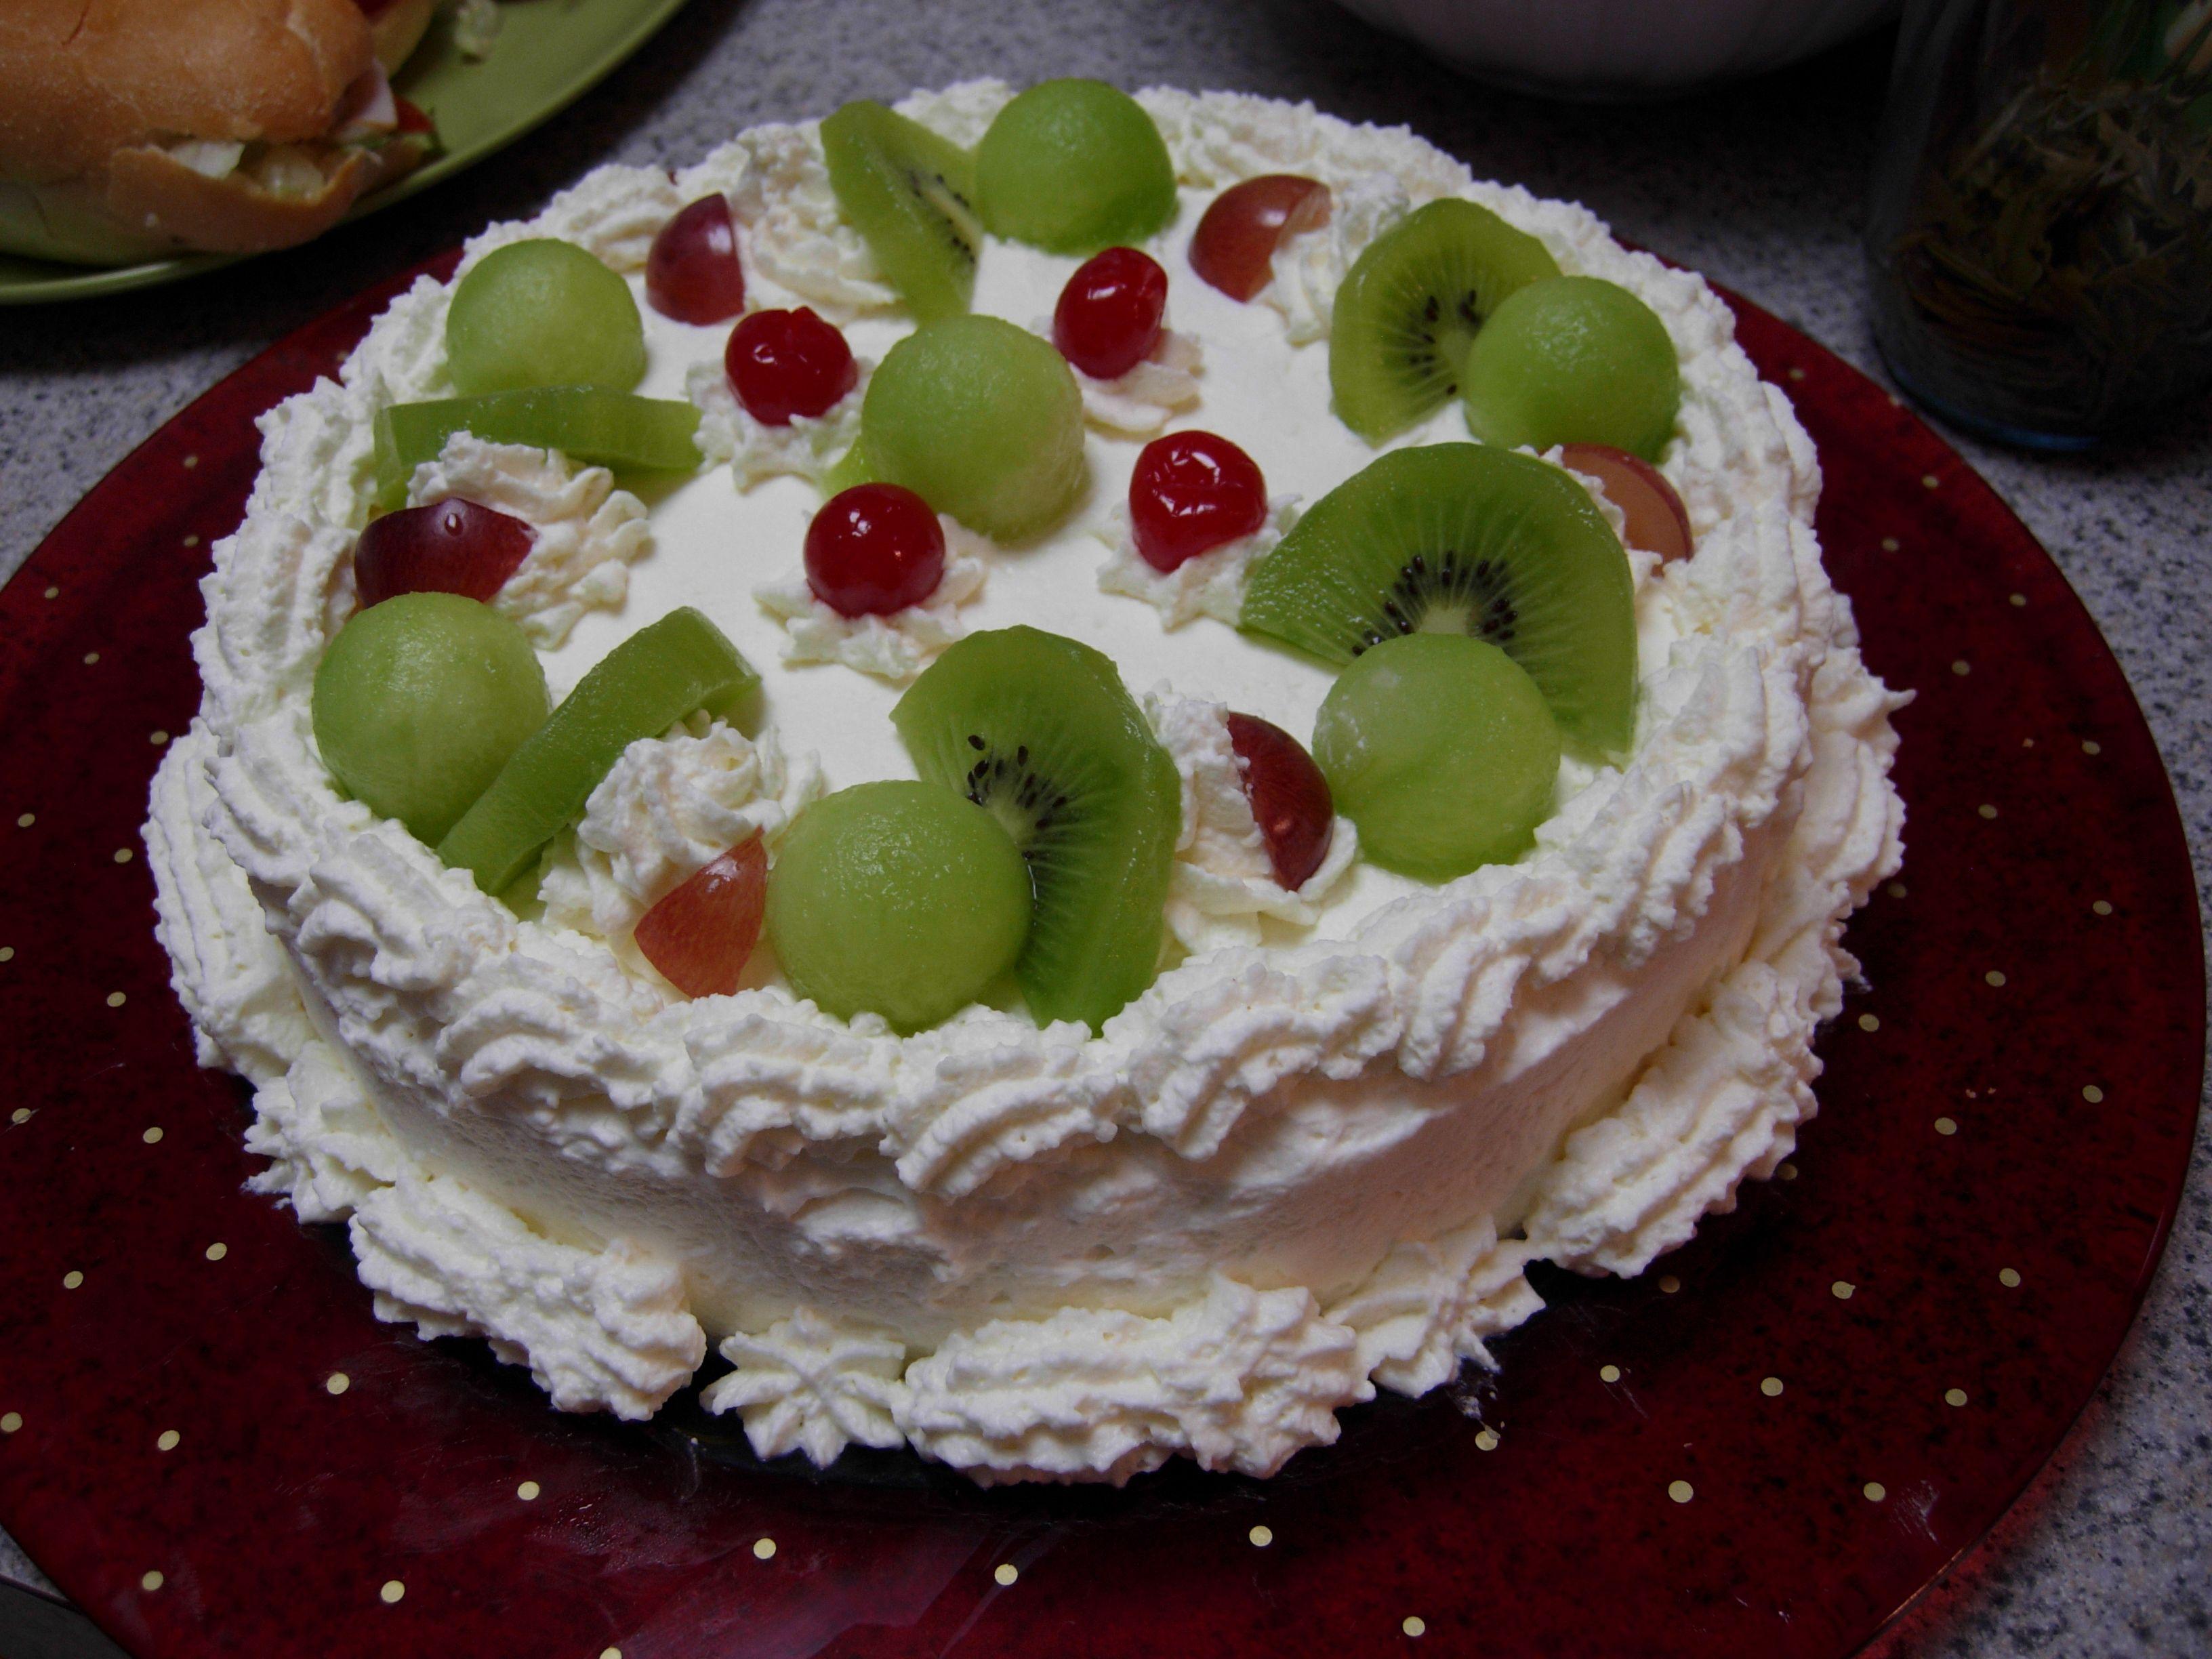 Tremendous 20 Wonderful Image Of Asian Birthday Cake Best Fruit Cake Funny Birthday Cards Online Elaedamsfinfo